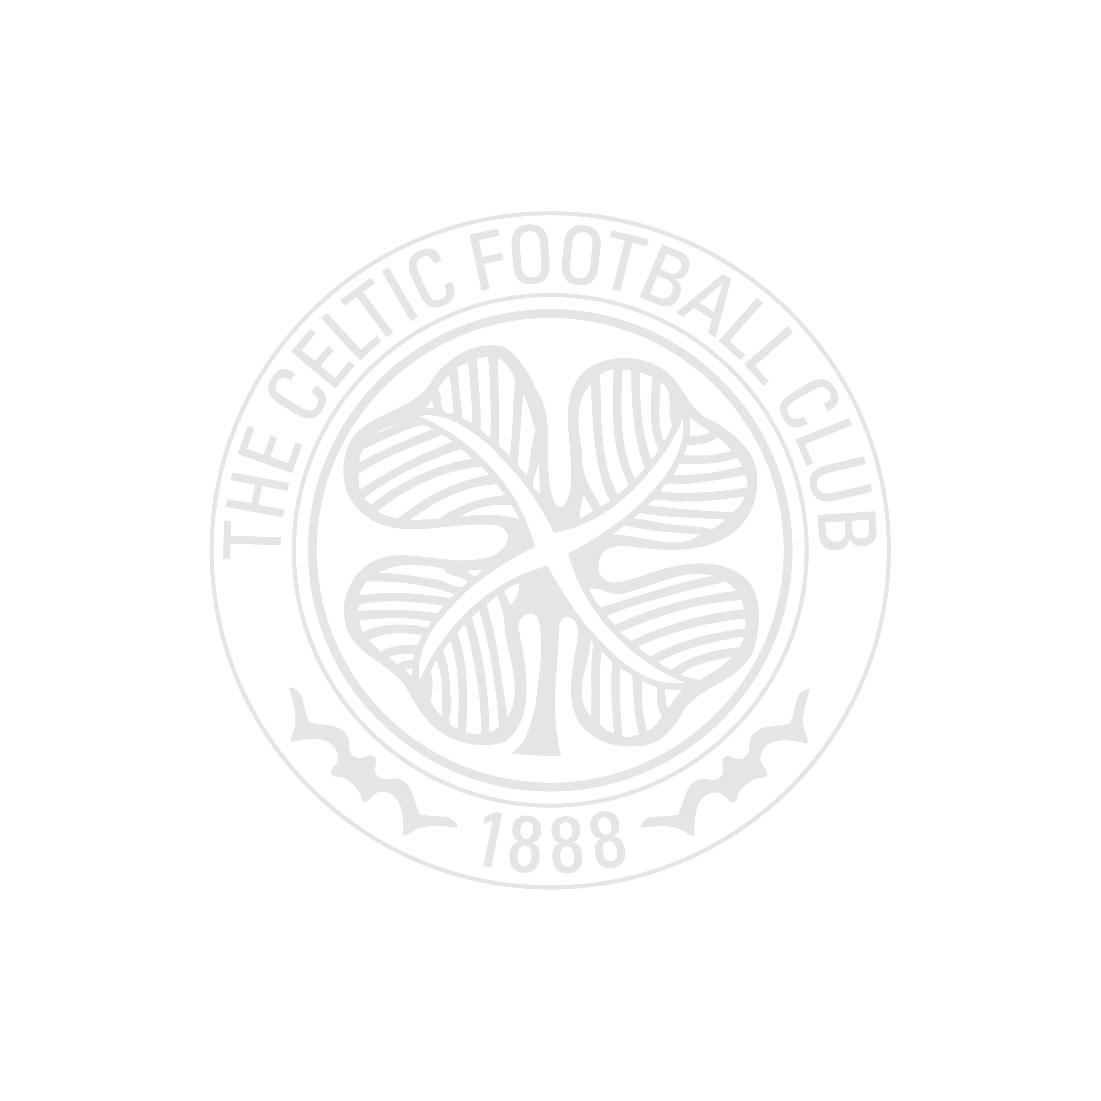 Celtic Mens Home Sock 19/20 - change sock - Player Issue